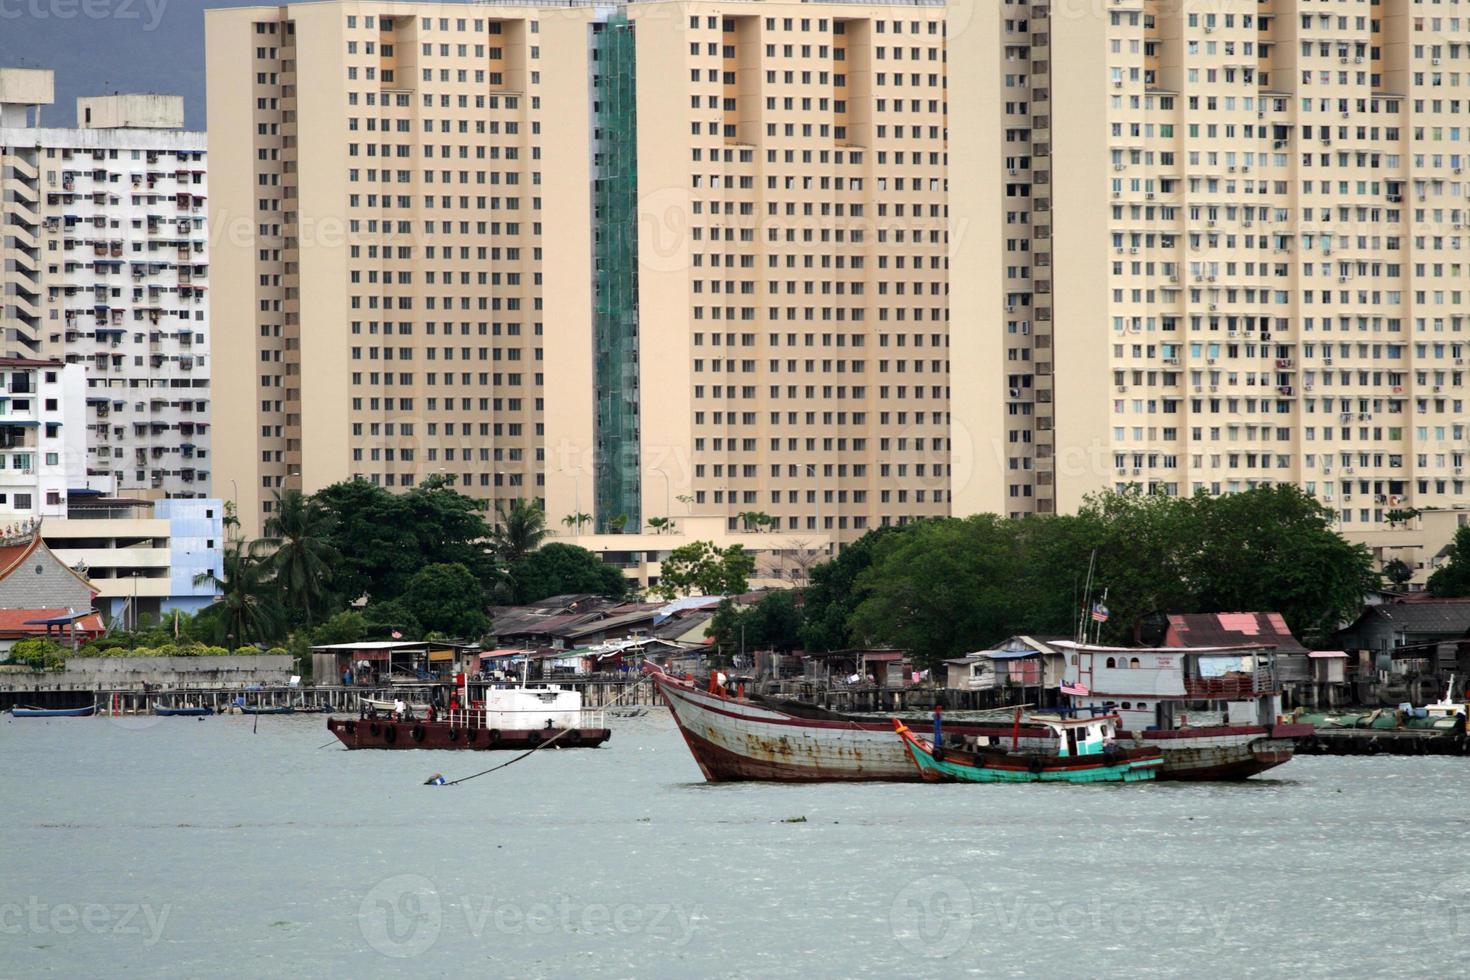 île de Penang, Malaisie photo